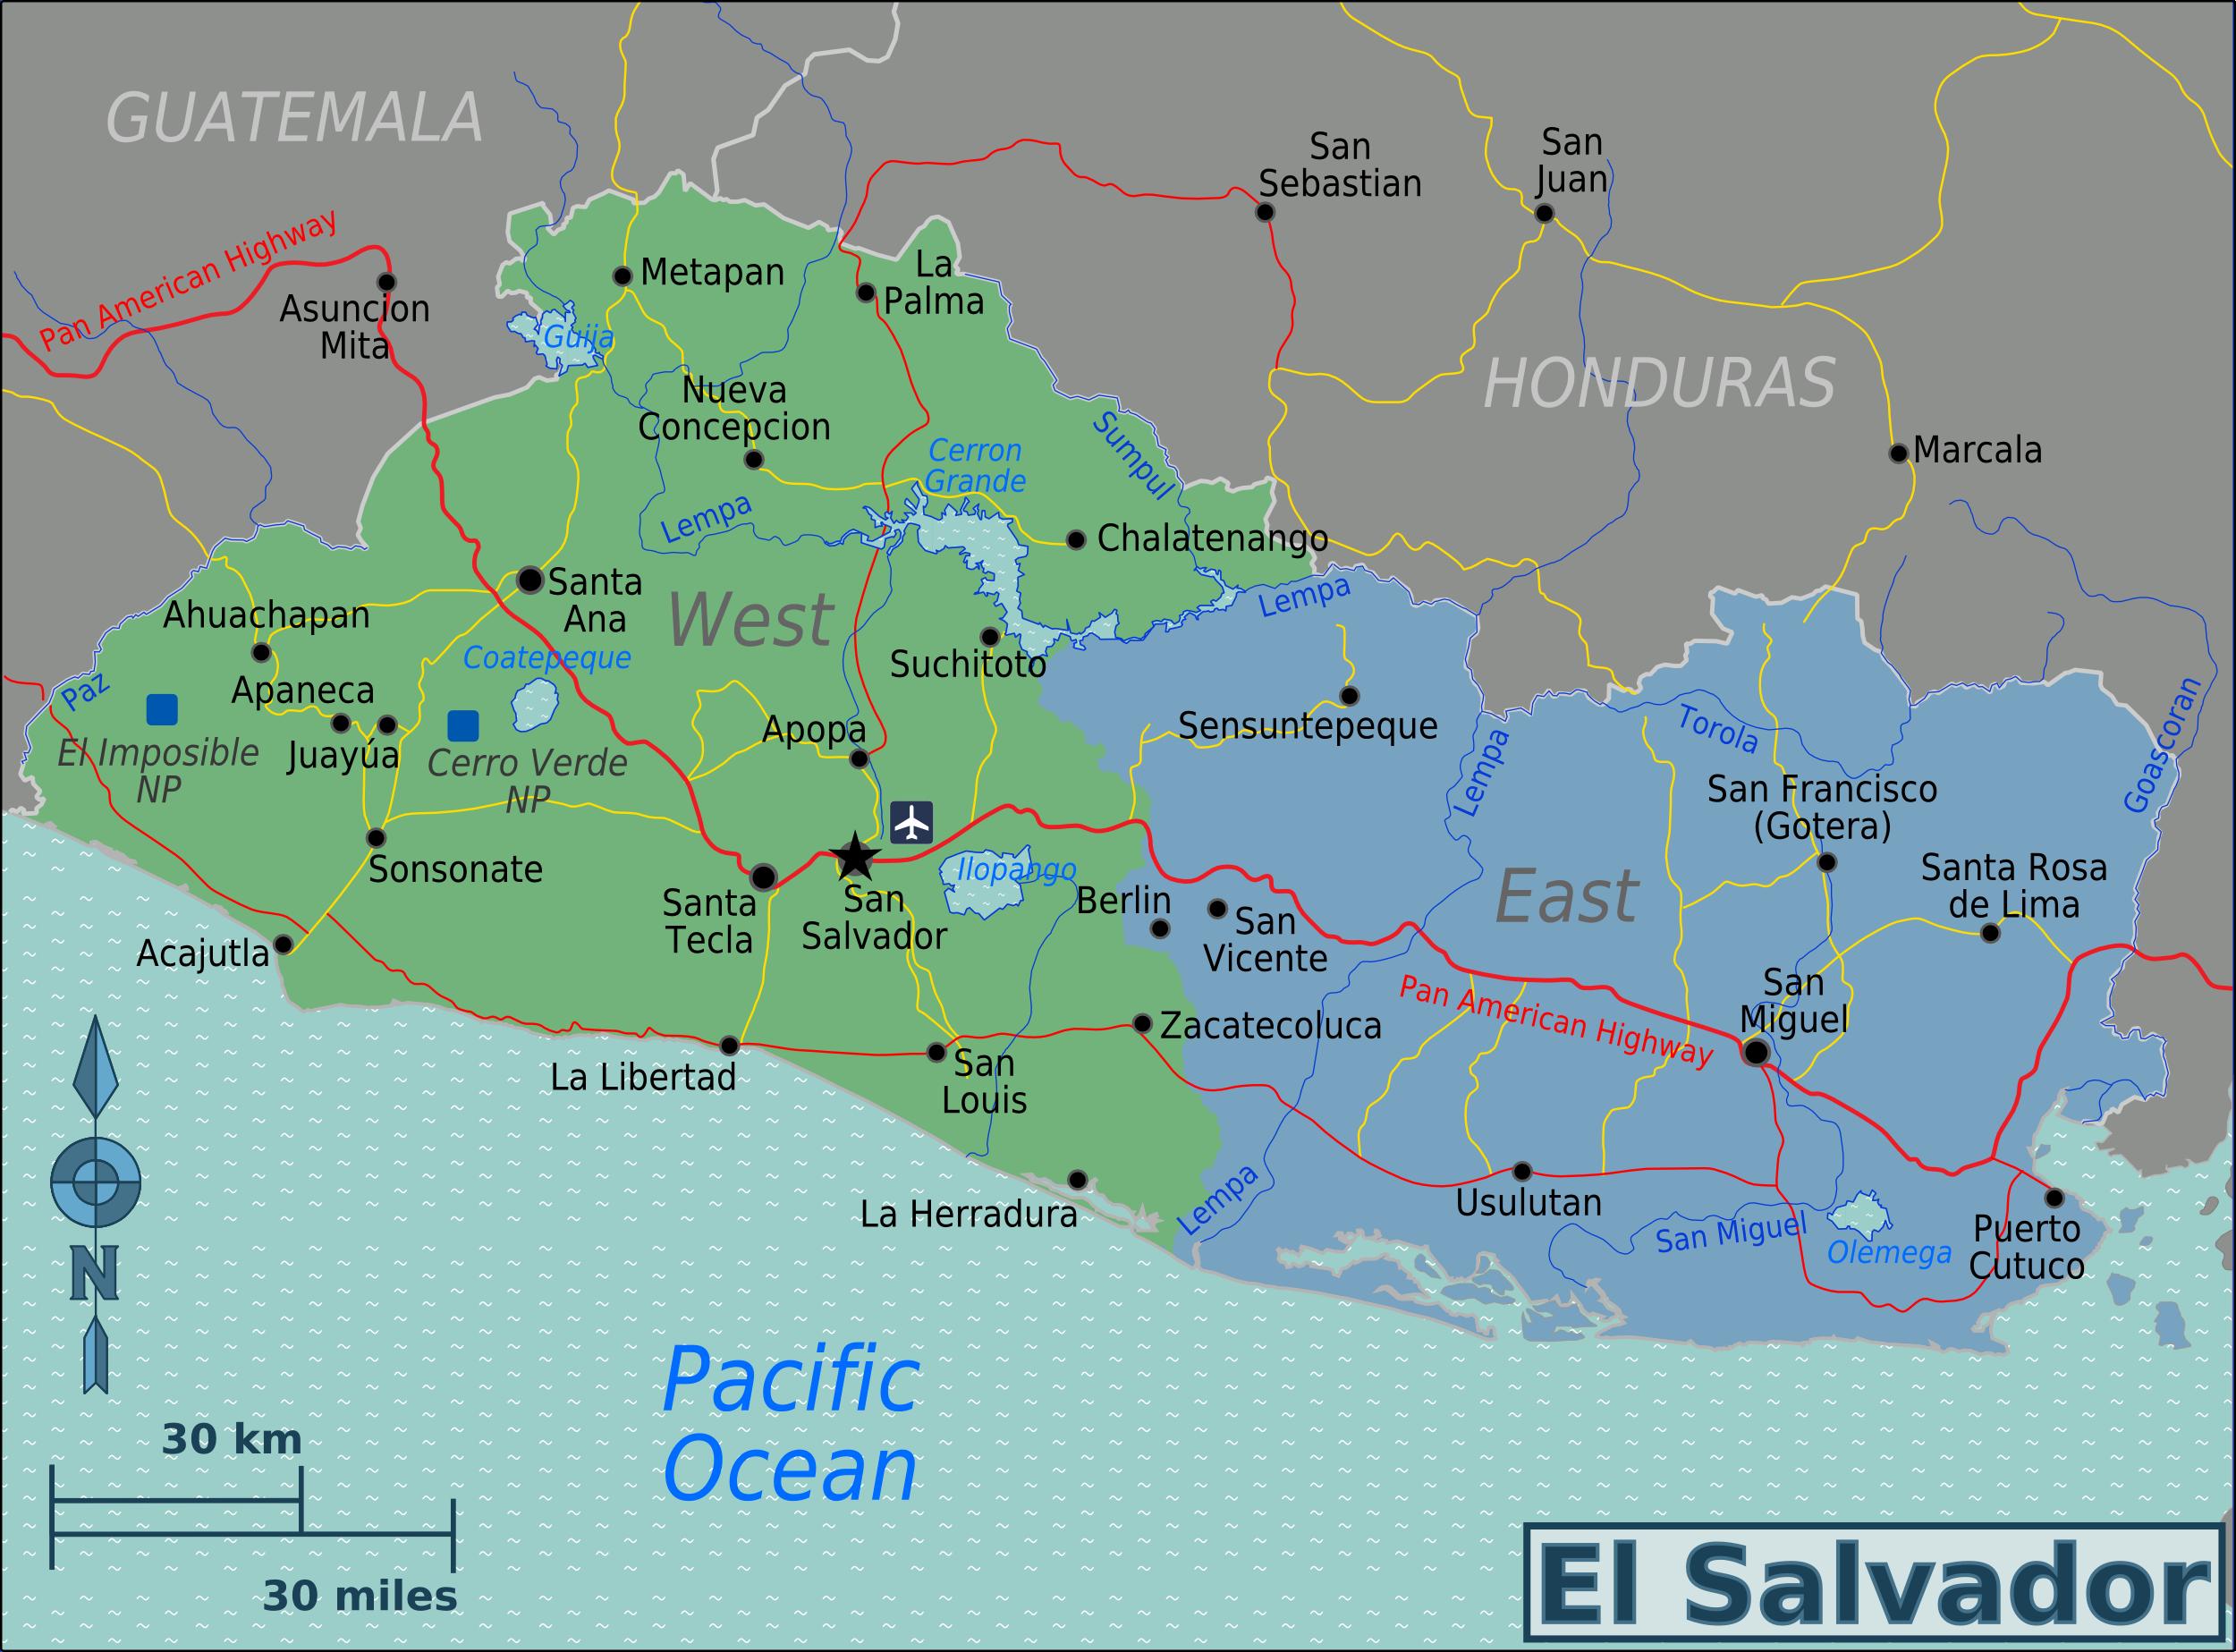 Region S Karte.El Salvador Regions Map Mappery